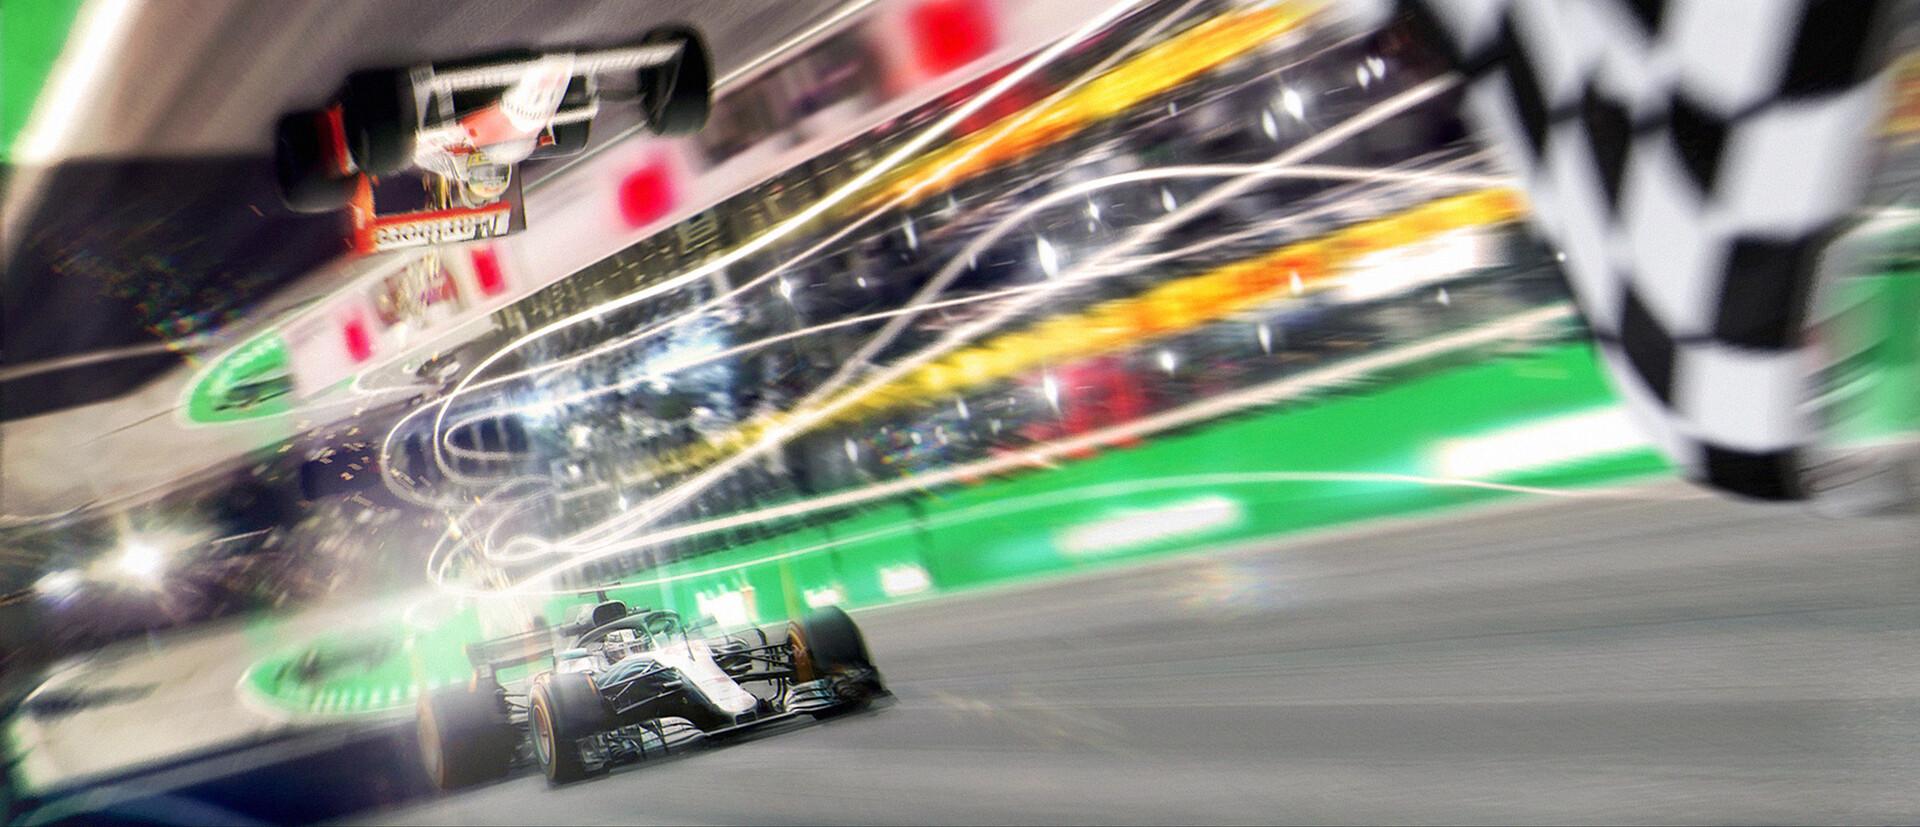 Hamilton vs Senna racing down Interlagos!